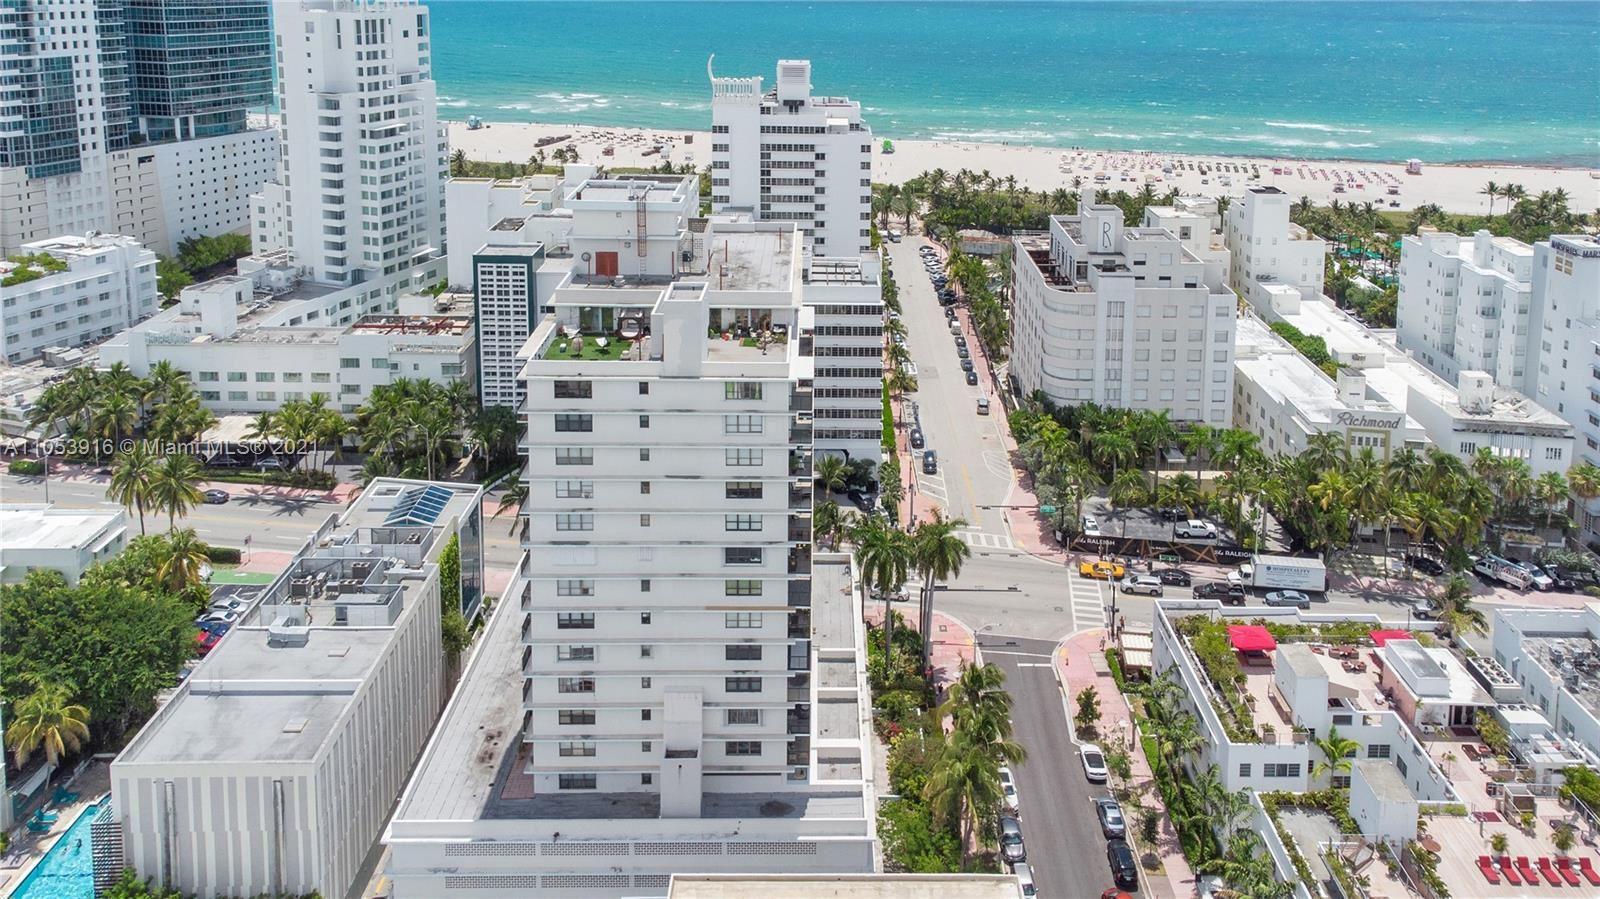 1800 Collins Ave #7A, Miami Beach, FL 33139 - #: A11053916